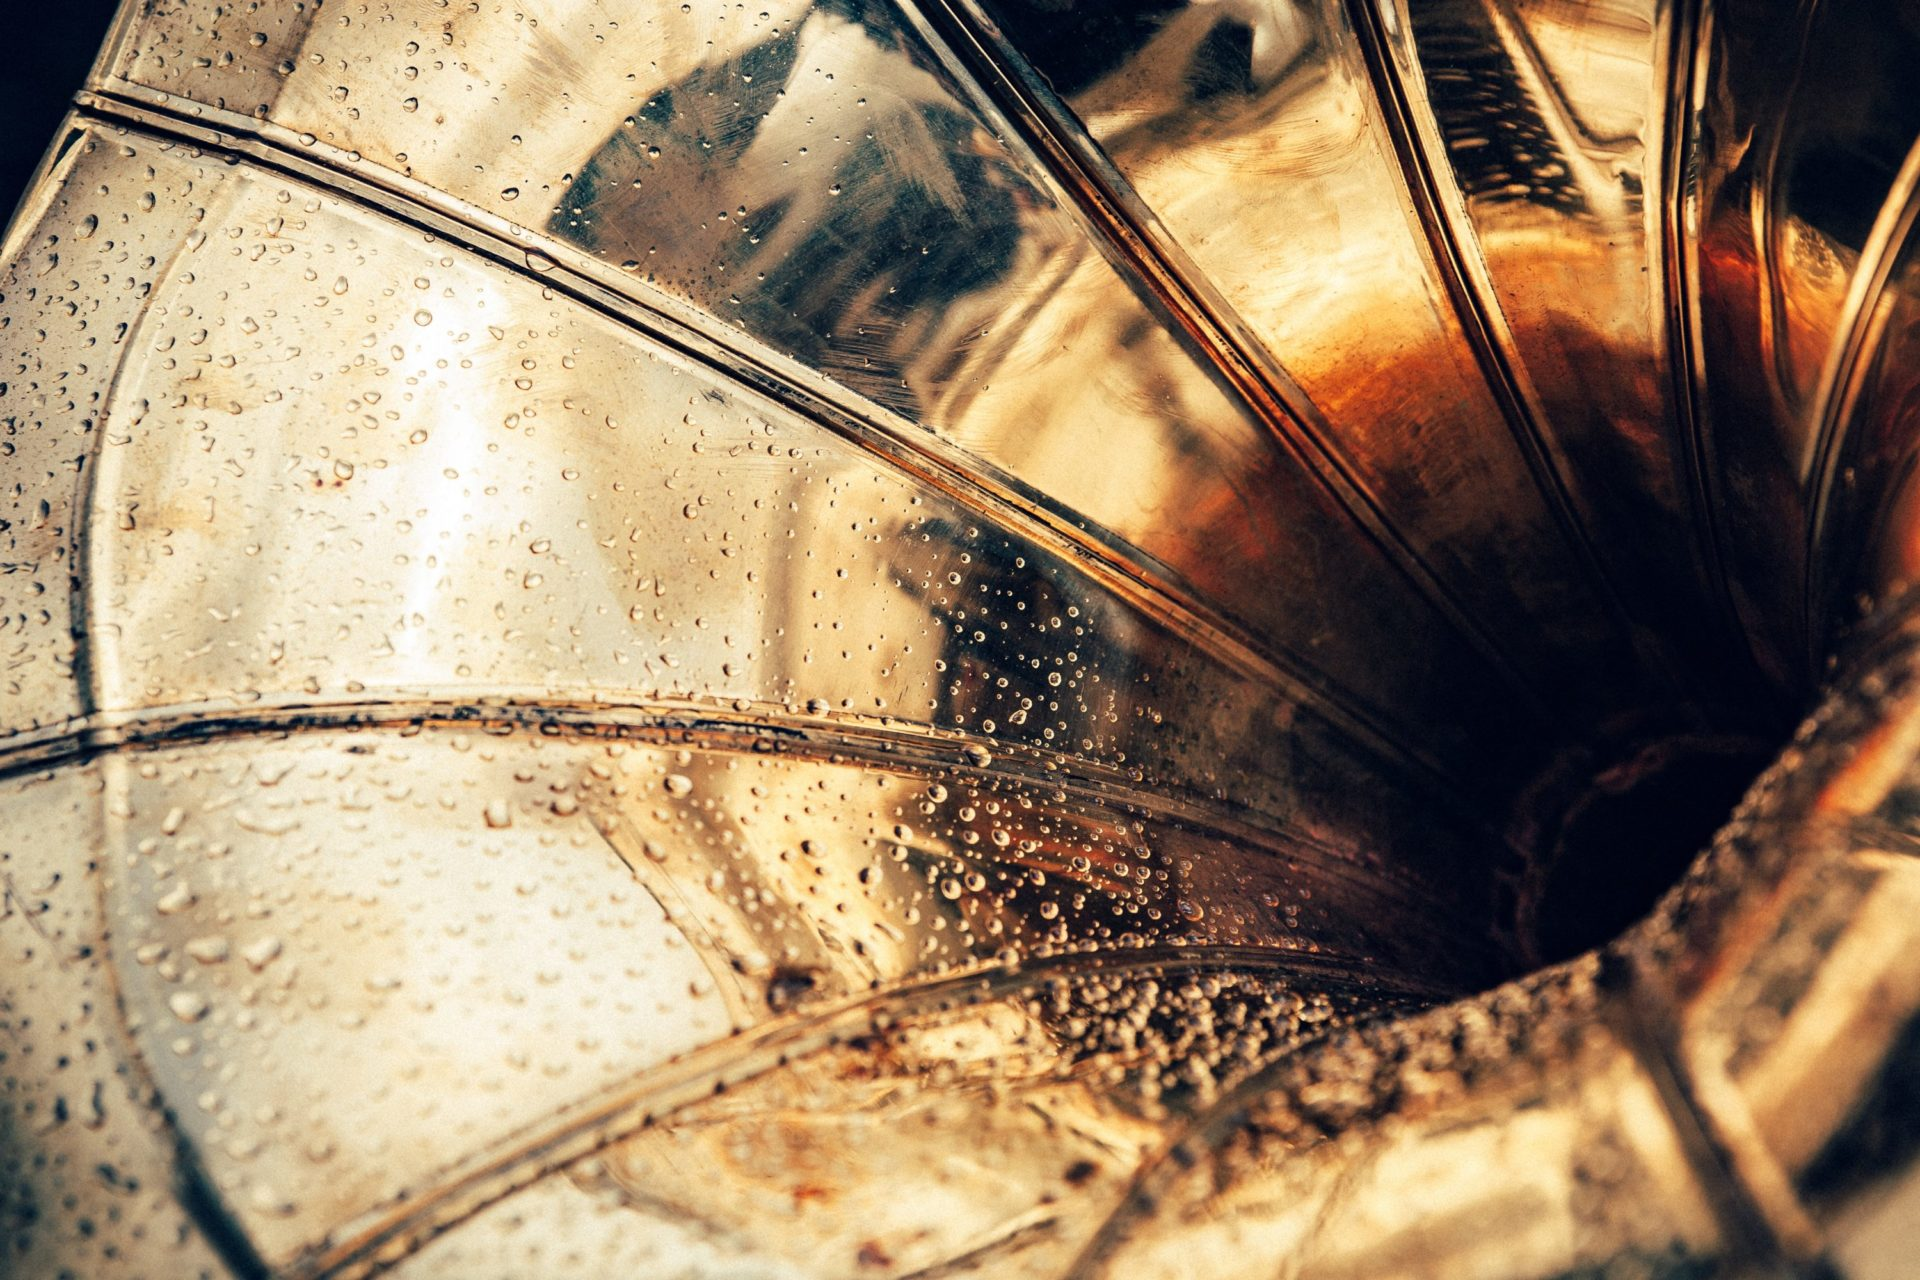 Bitcoin (BTC) Can Surmount $8 Trillion Gold, Argues Crypto Billionaire 13